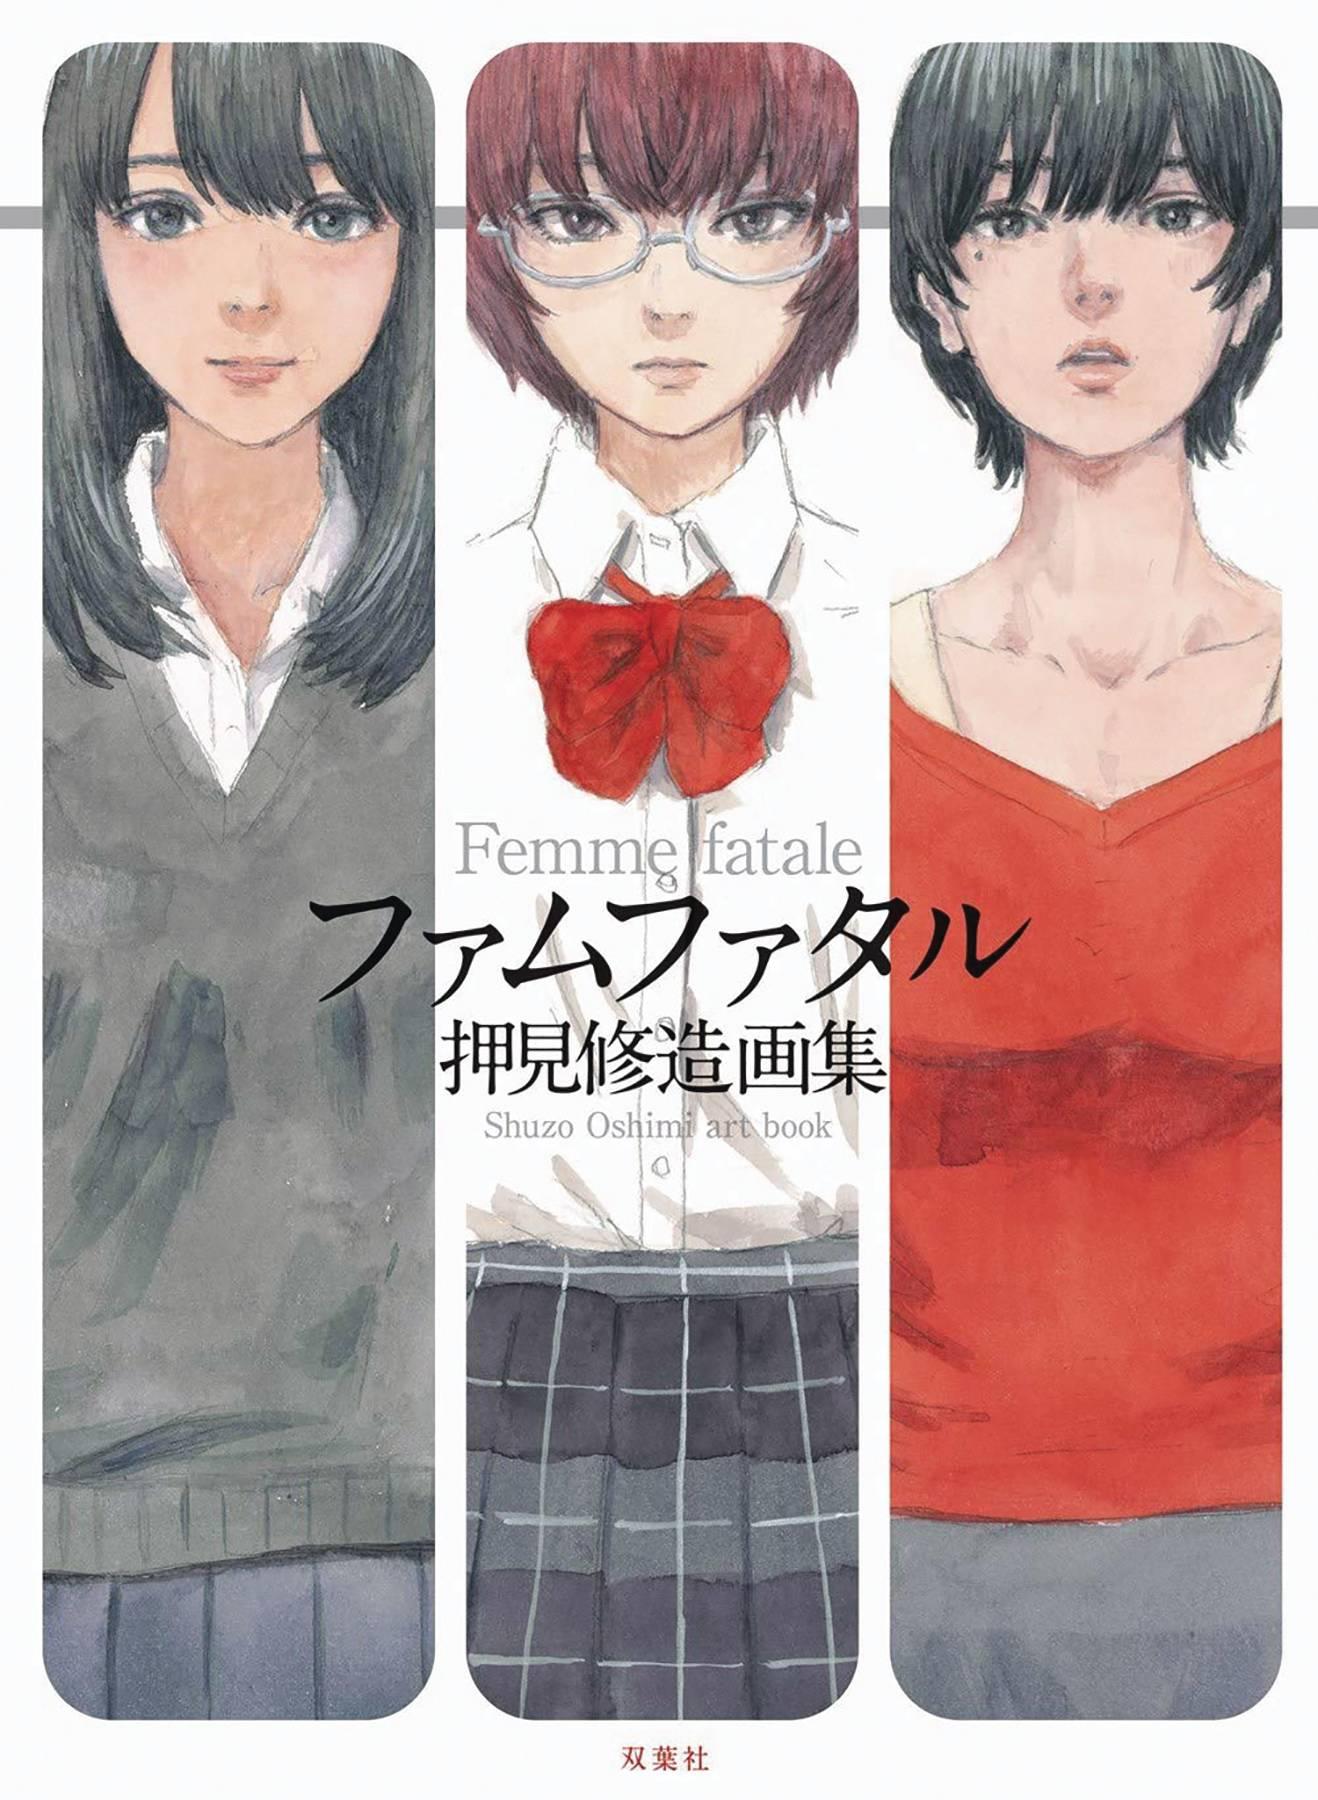 FEMME FATALE ART OF SHUZO OSHIMI SC